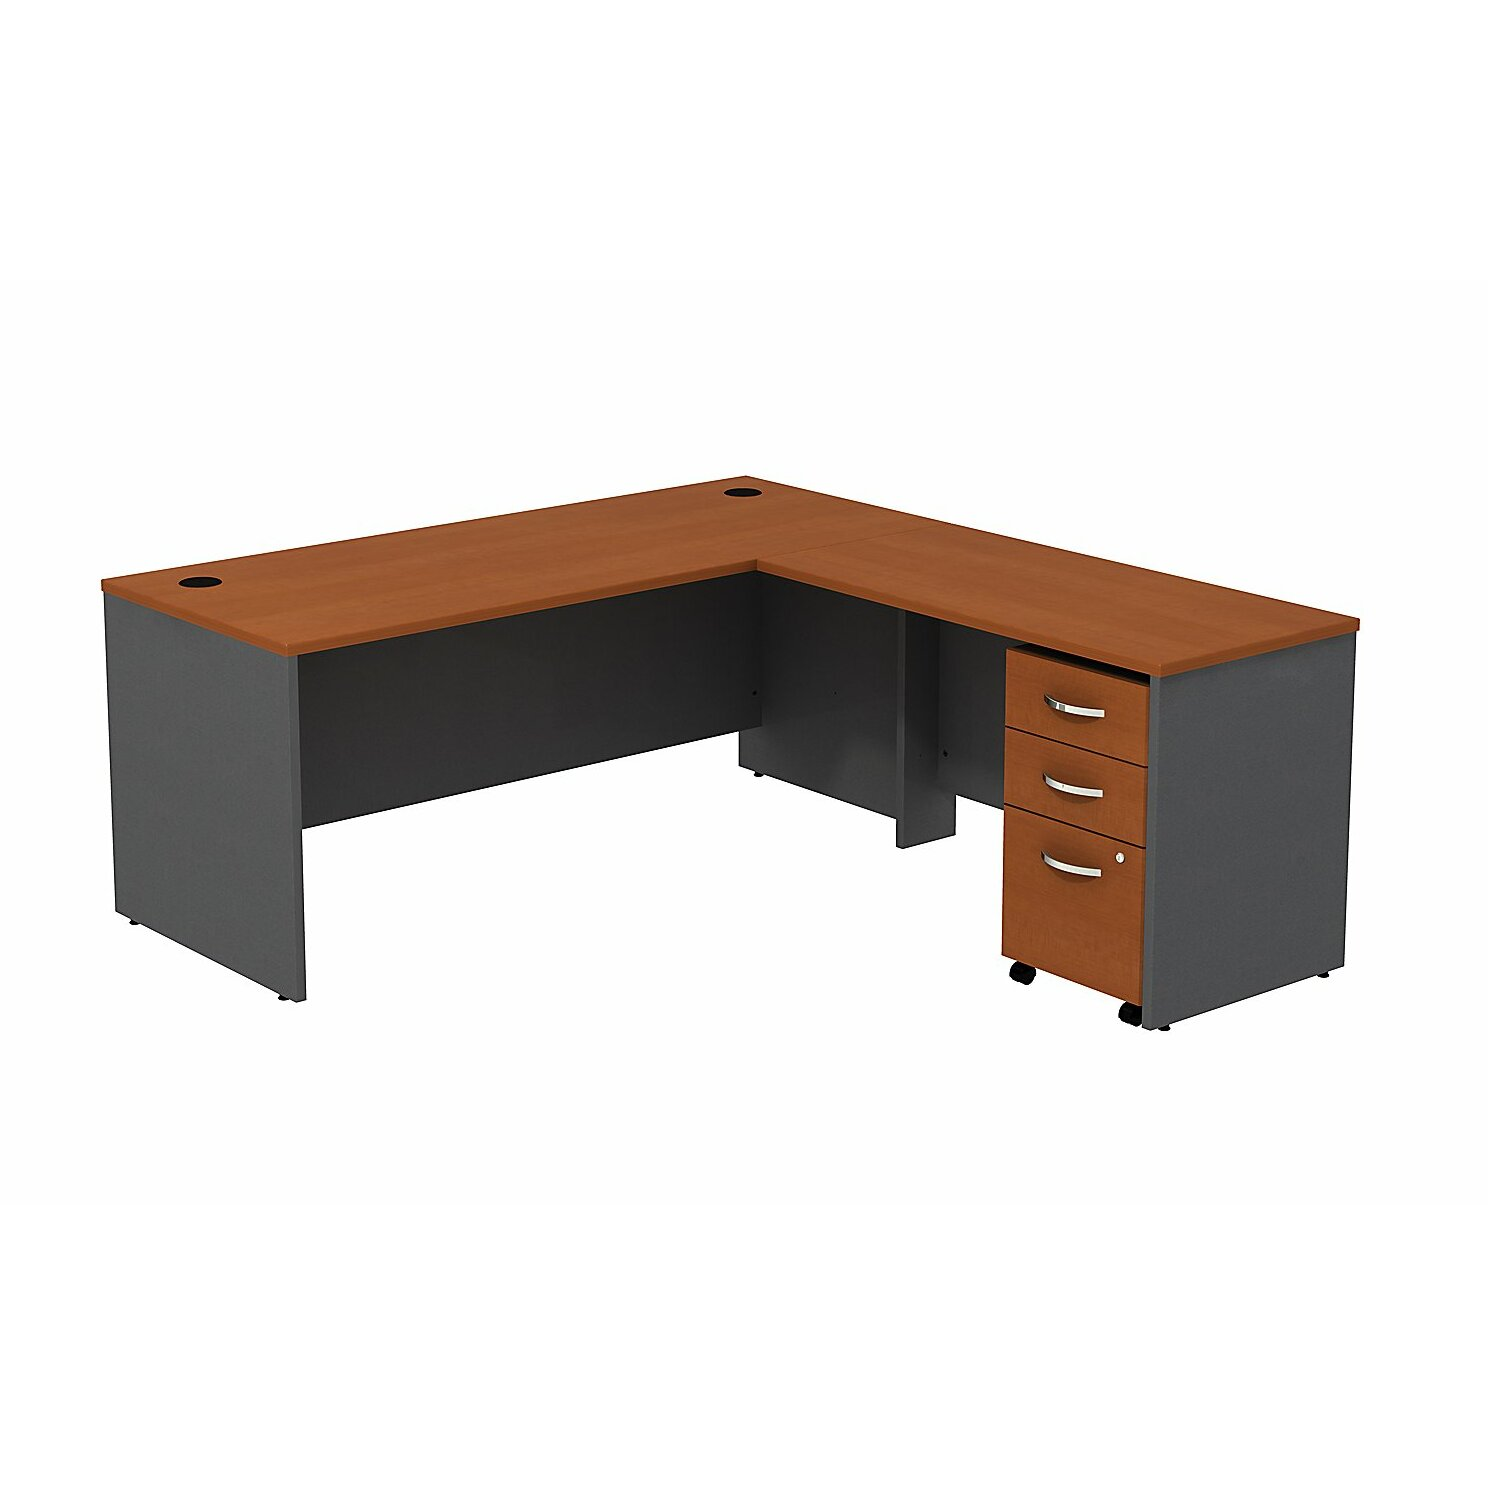 Furniture Office Furniture Executive Desks Bush Business Furniture